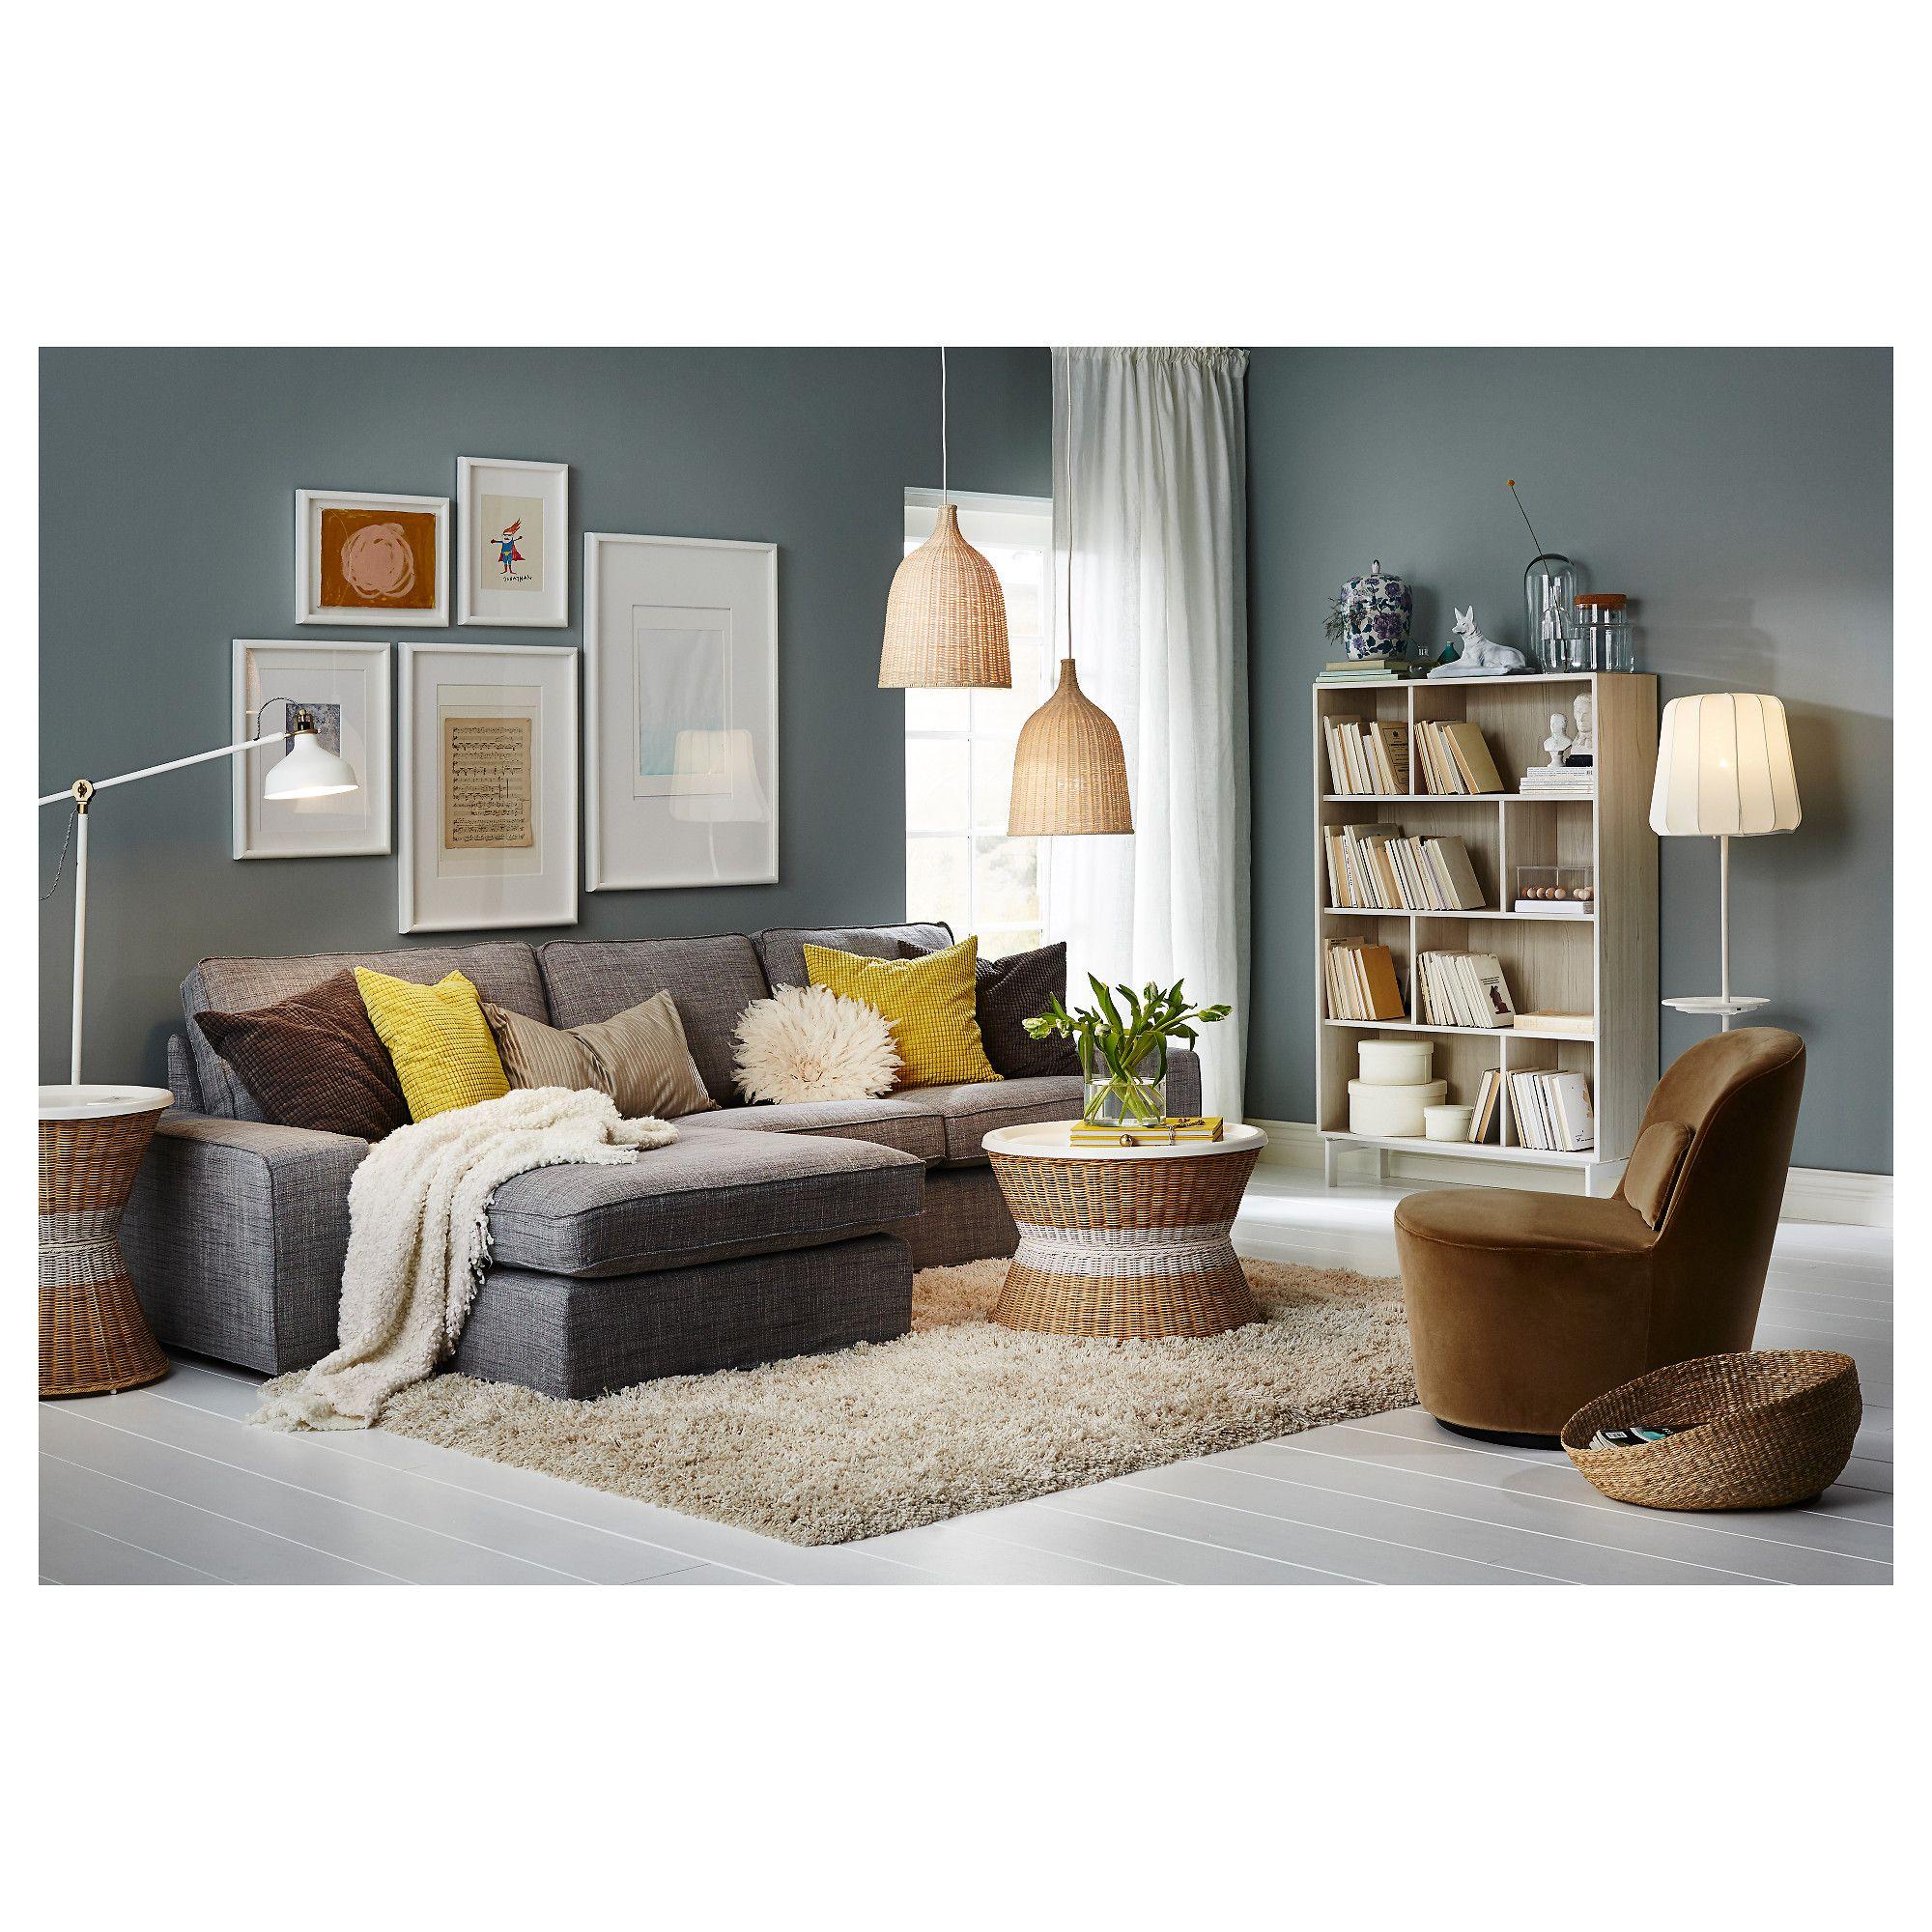 VALJE Shelf unit Larch white 100x150 cm